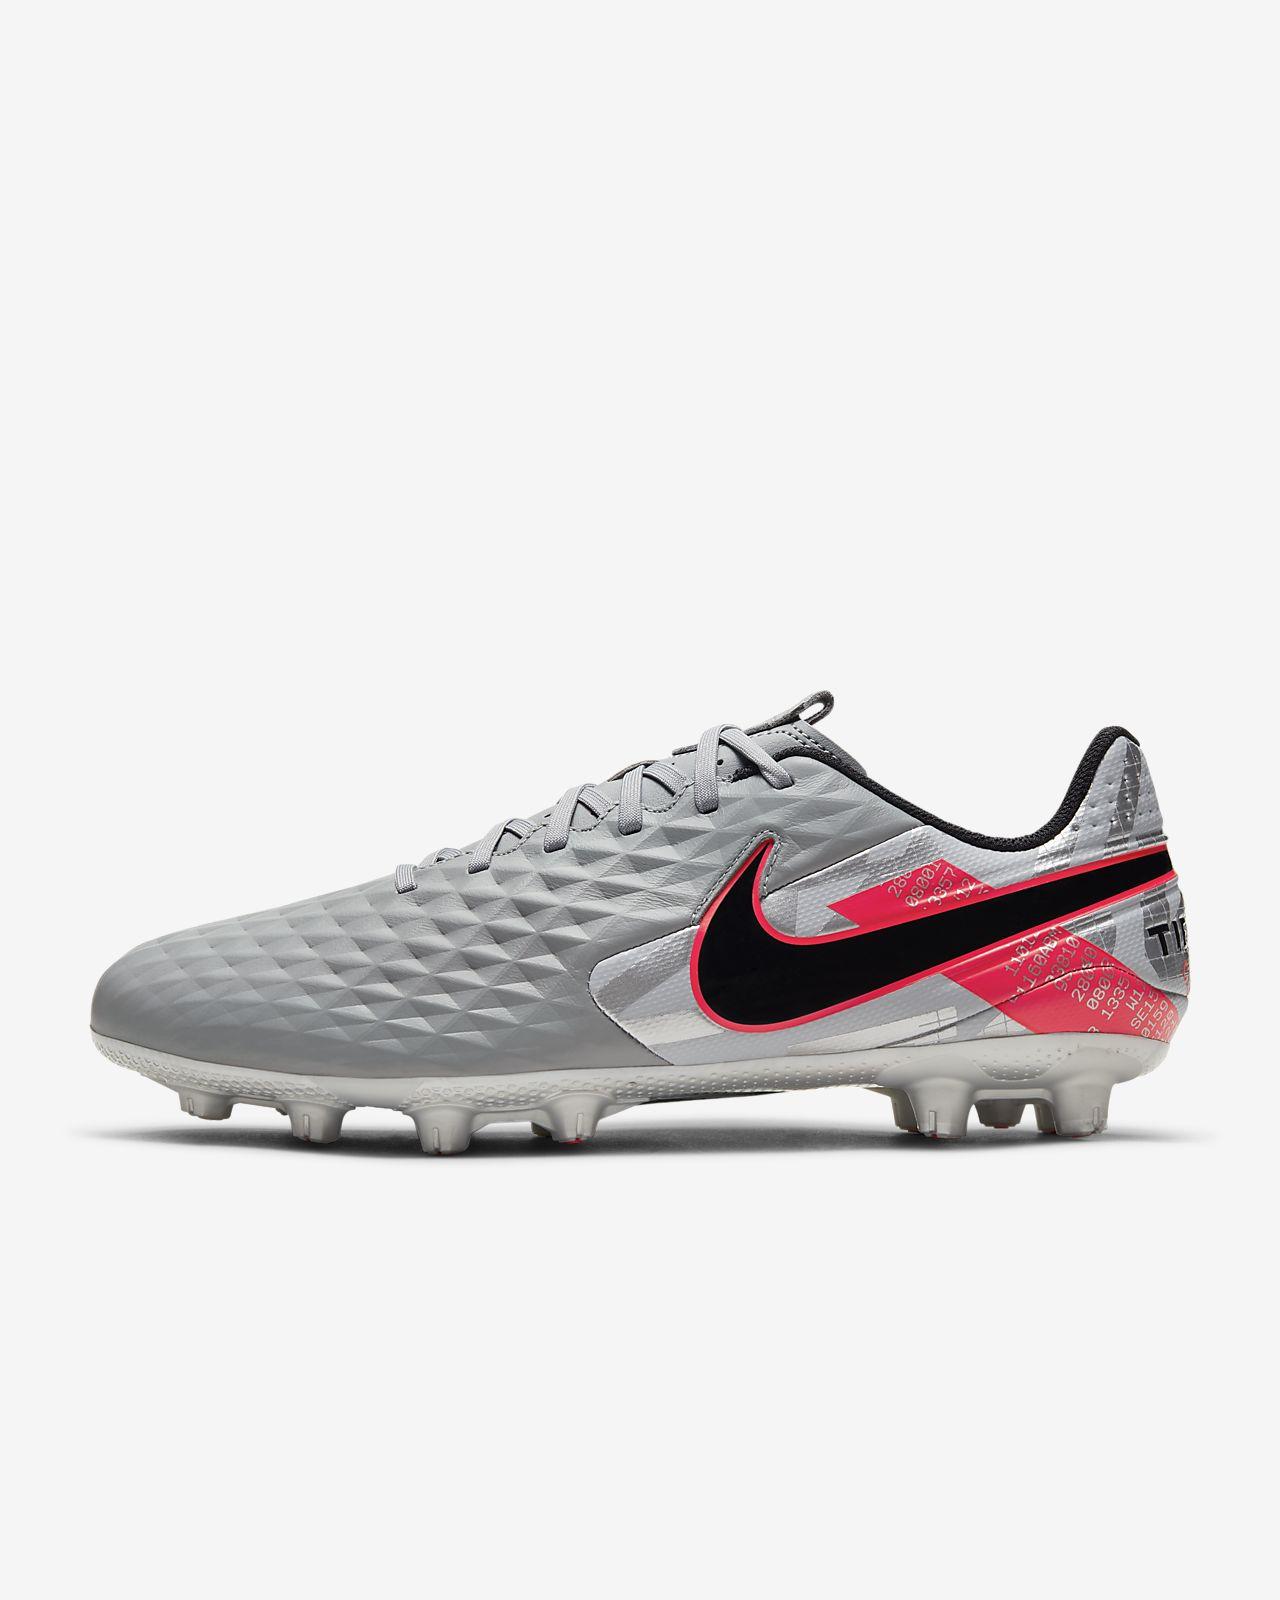 Nike Tiempo Legend 8 Academy HG Hard-Ground Soccer Cleat